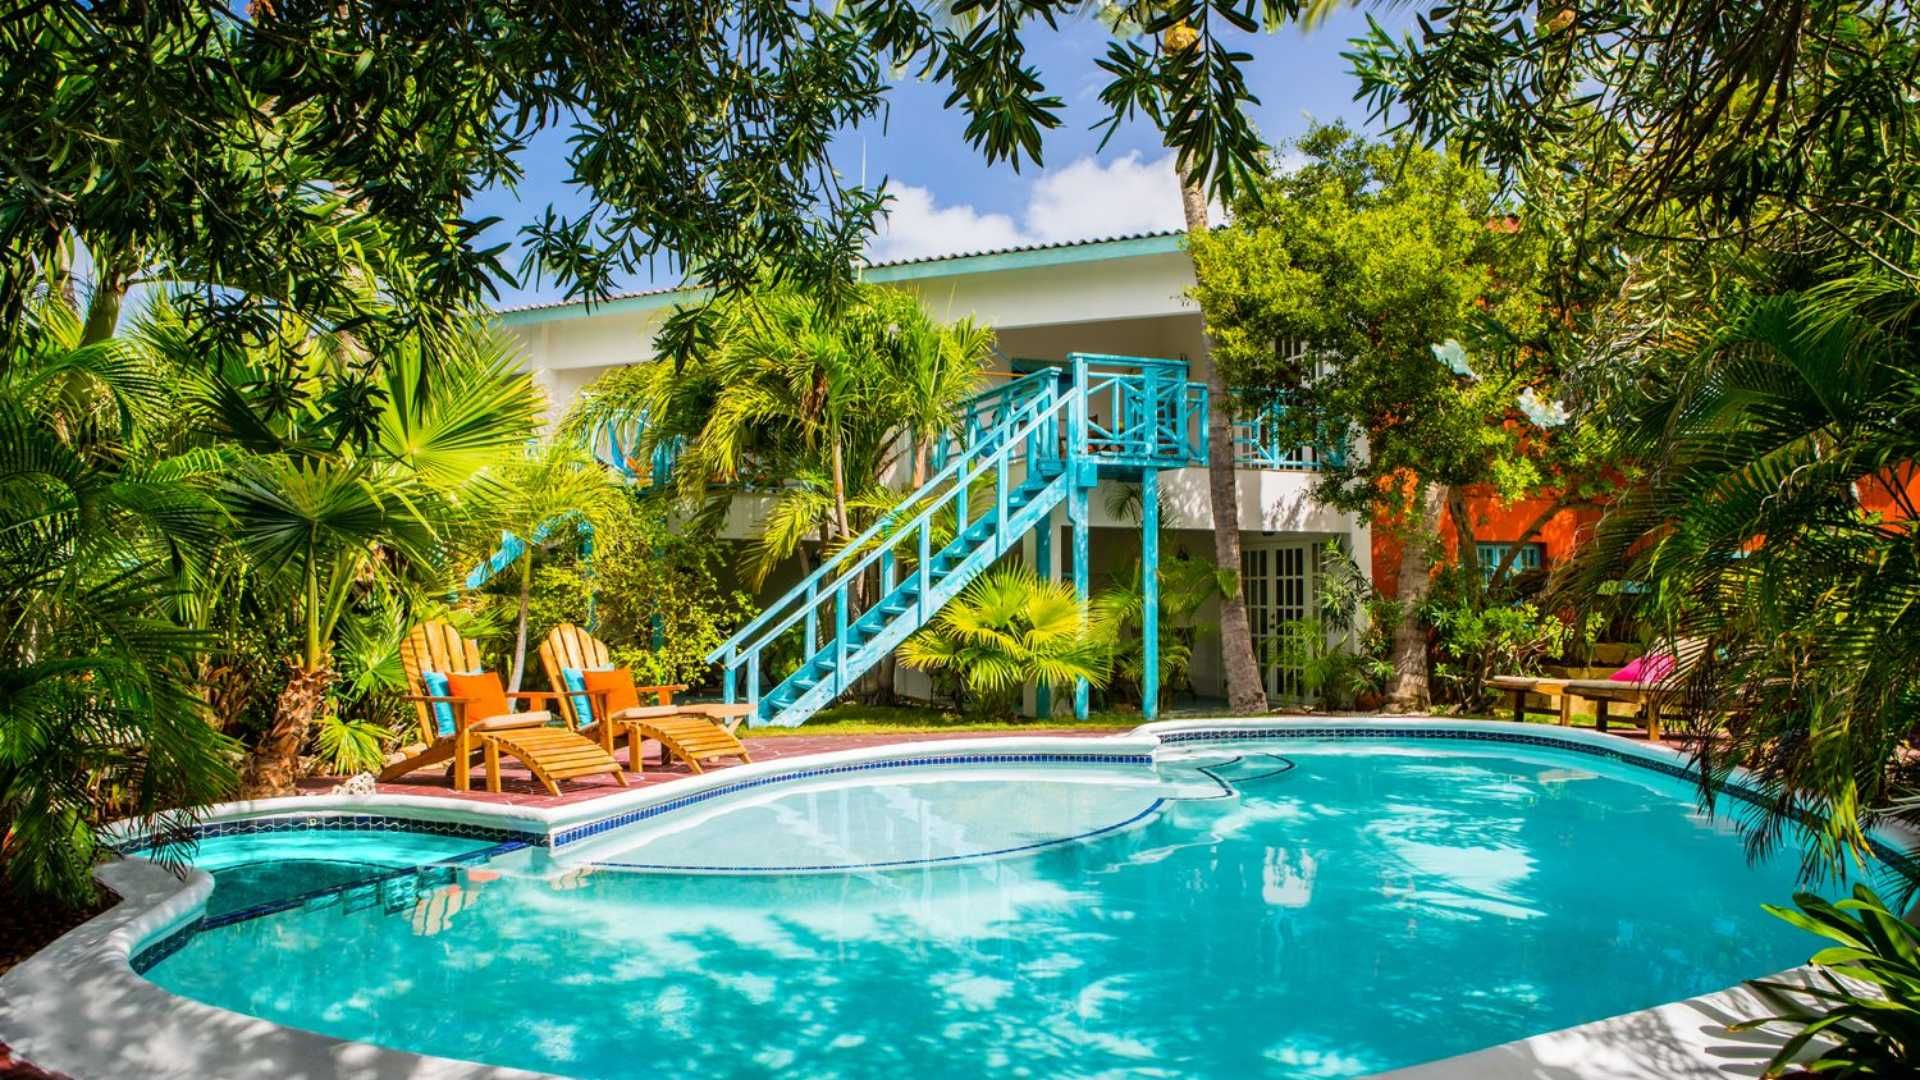 Boardwalk, Small Hotel Aruba - Palm Beach - Aruba | Wonderland ...